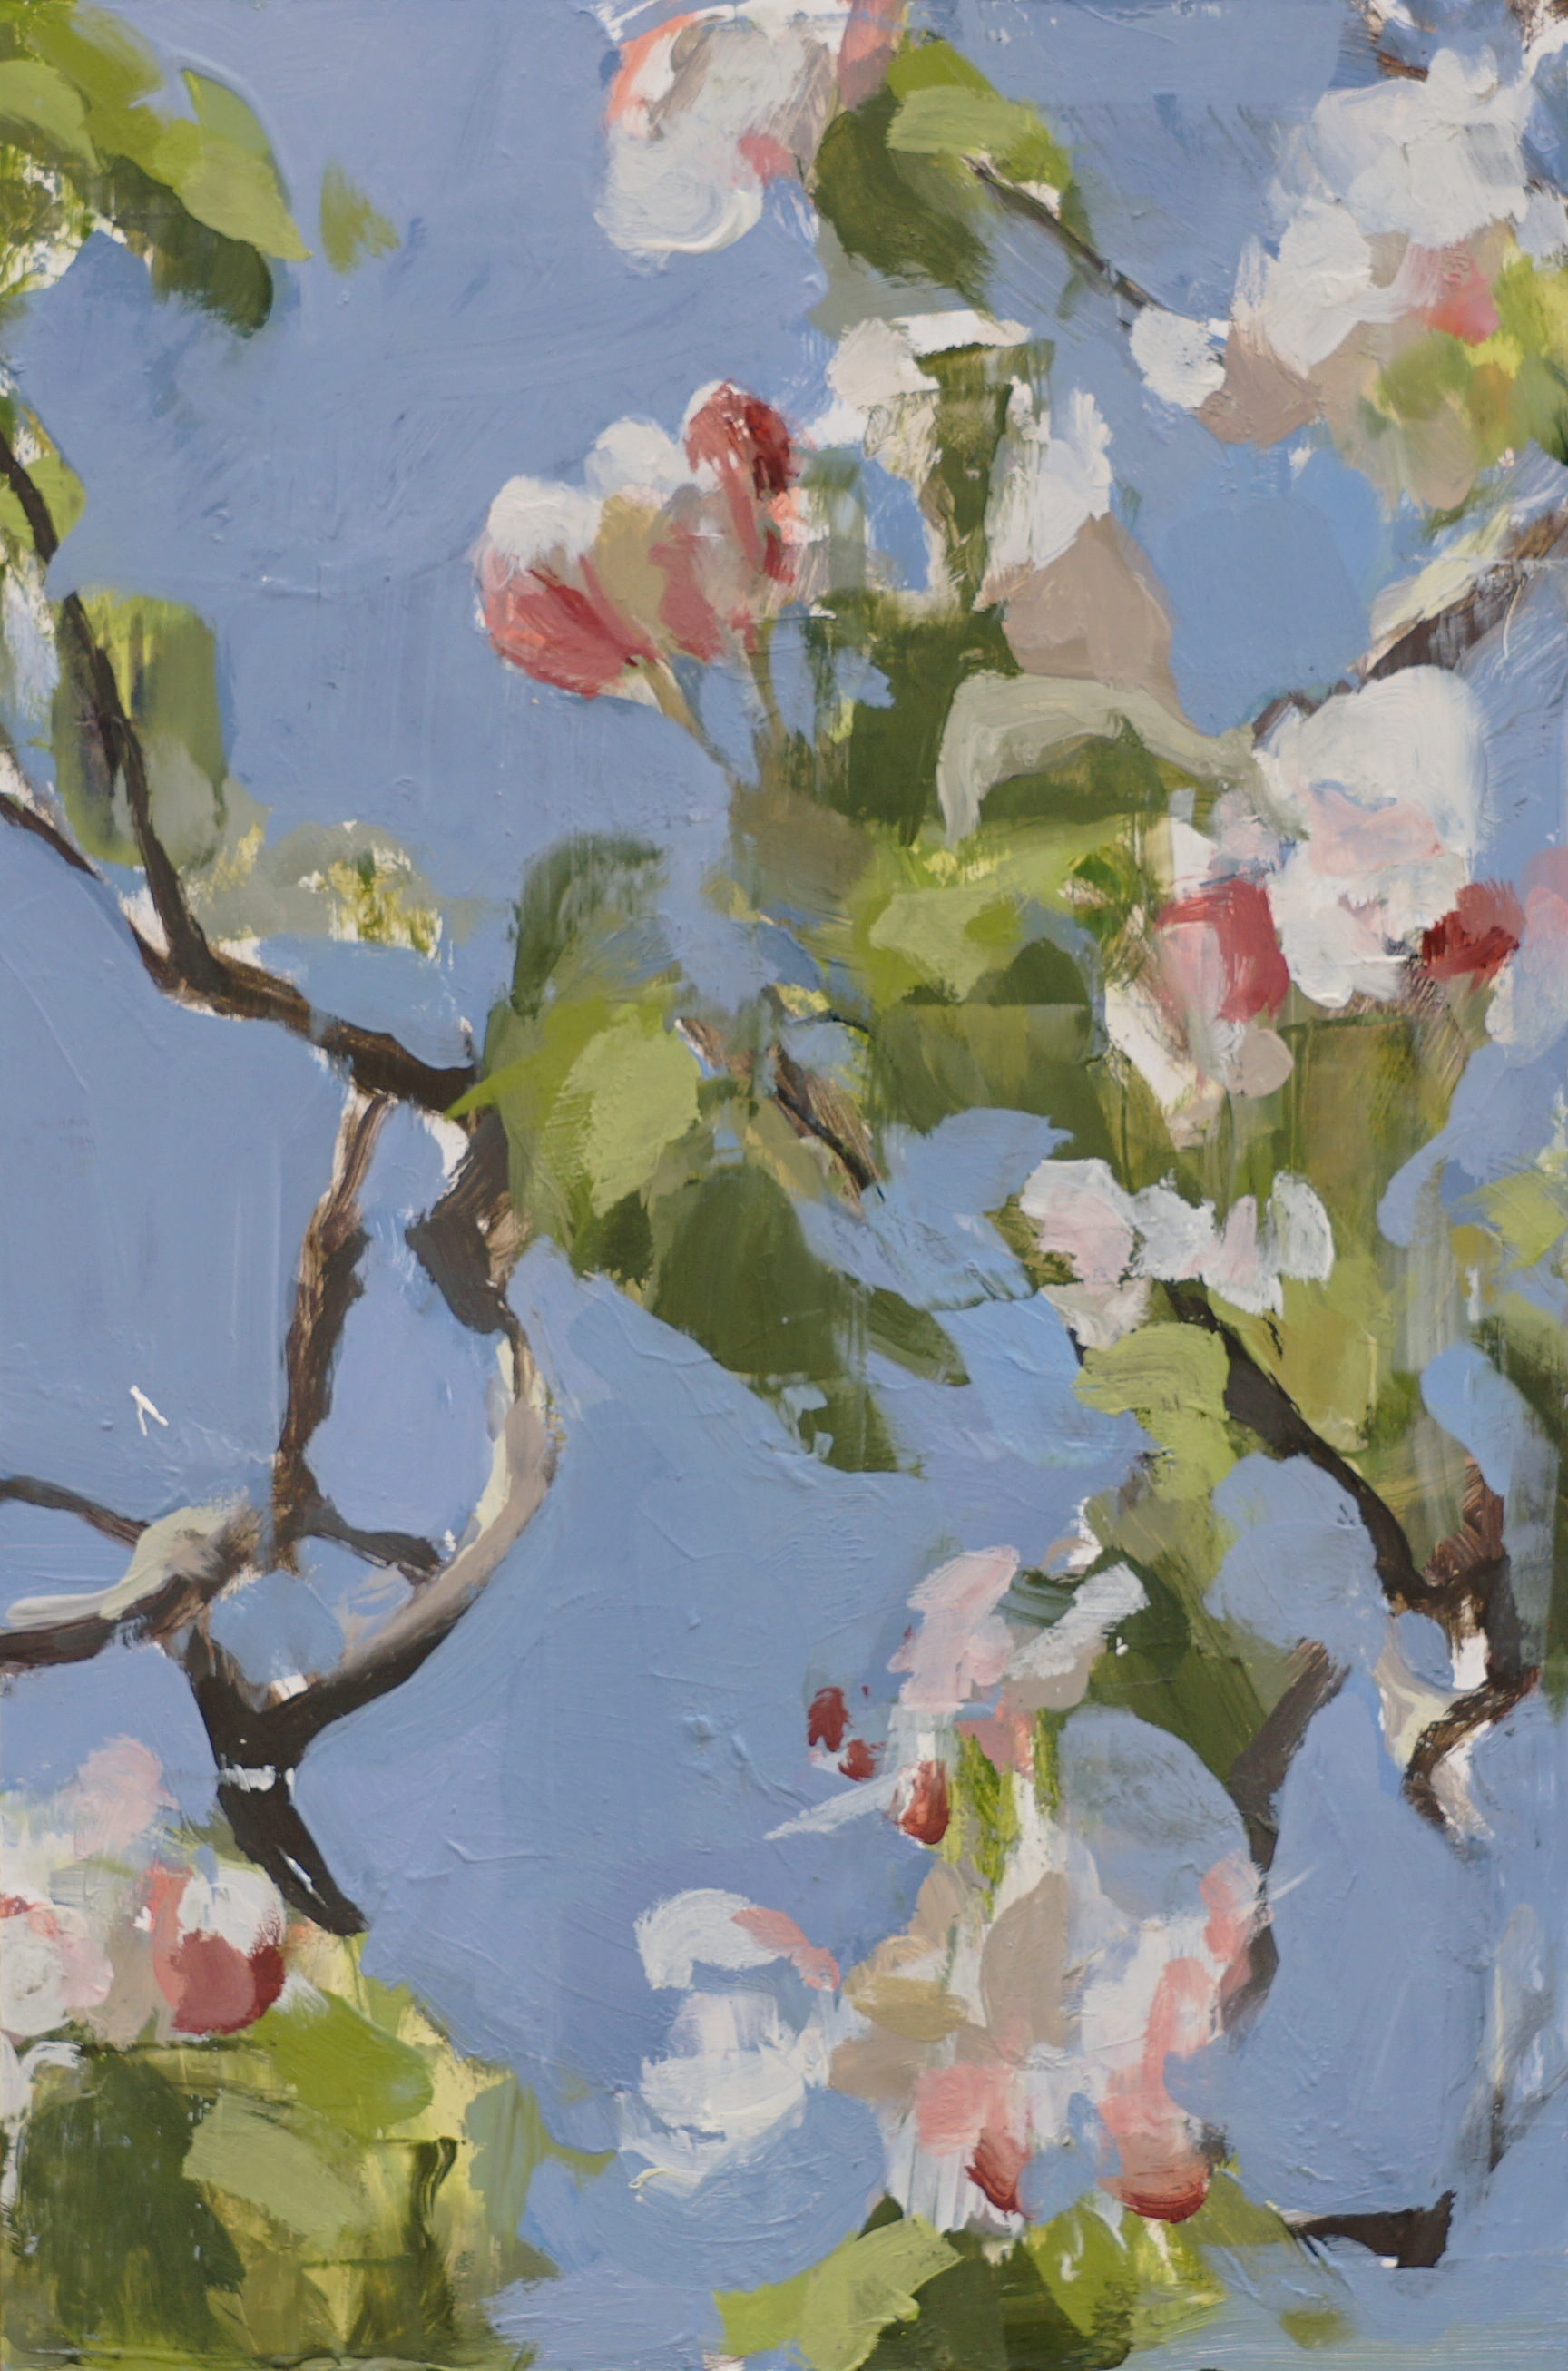 mark-crenshaw-1735-apple-blossom-(floral-pattern)-b.jpg